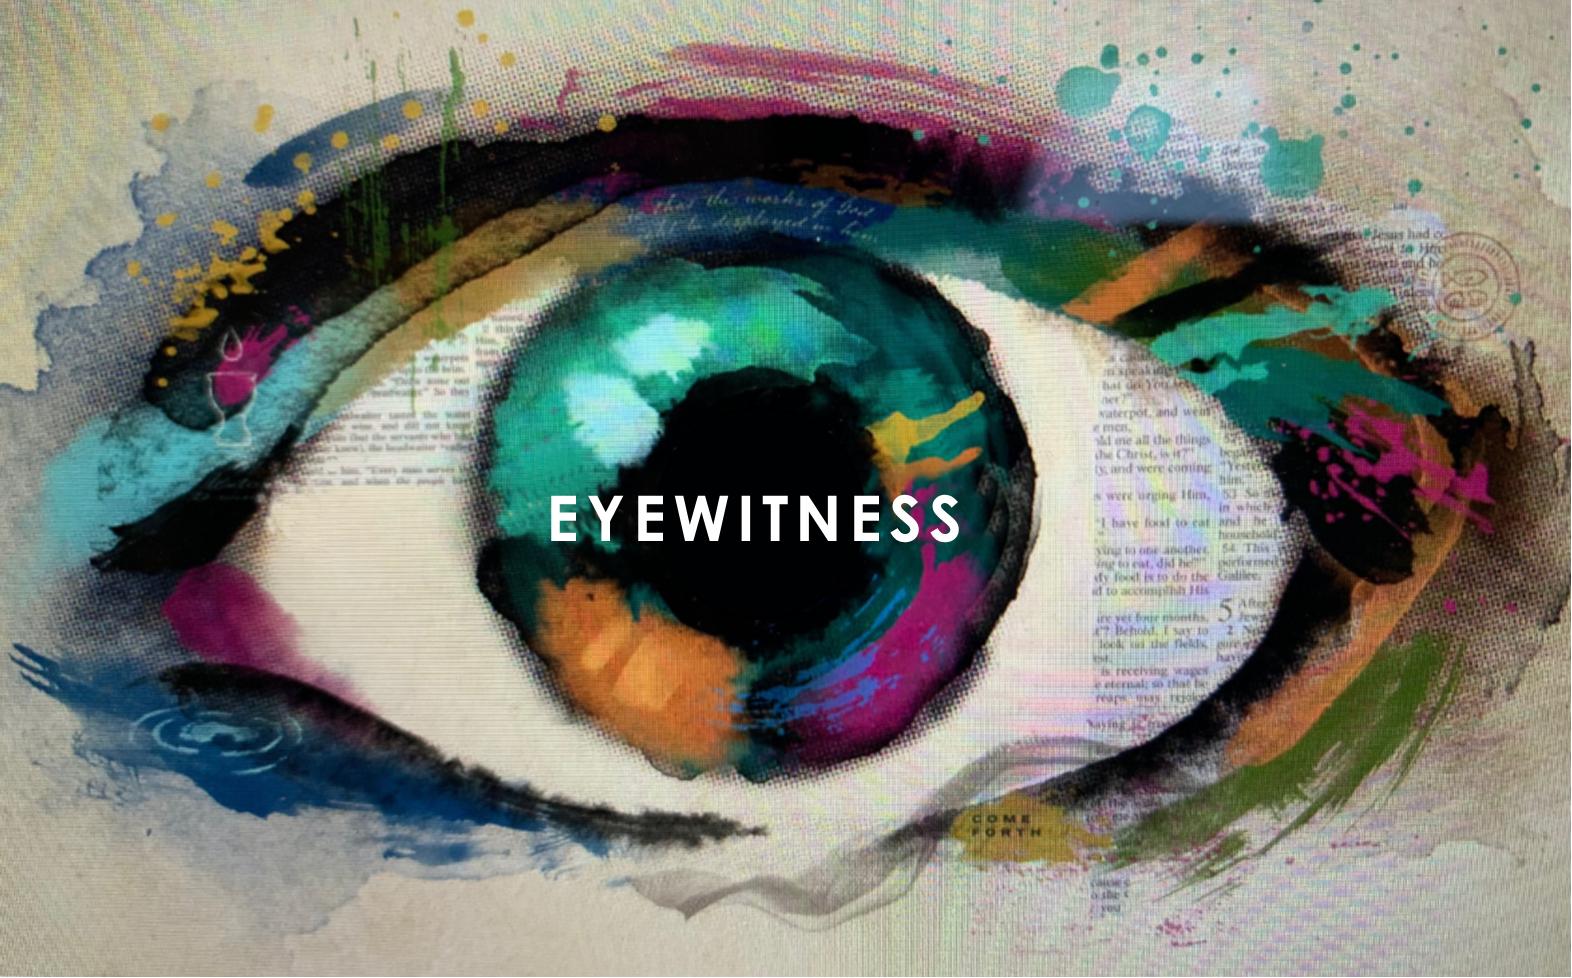 Eyewitness Image.jpg